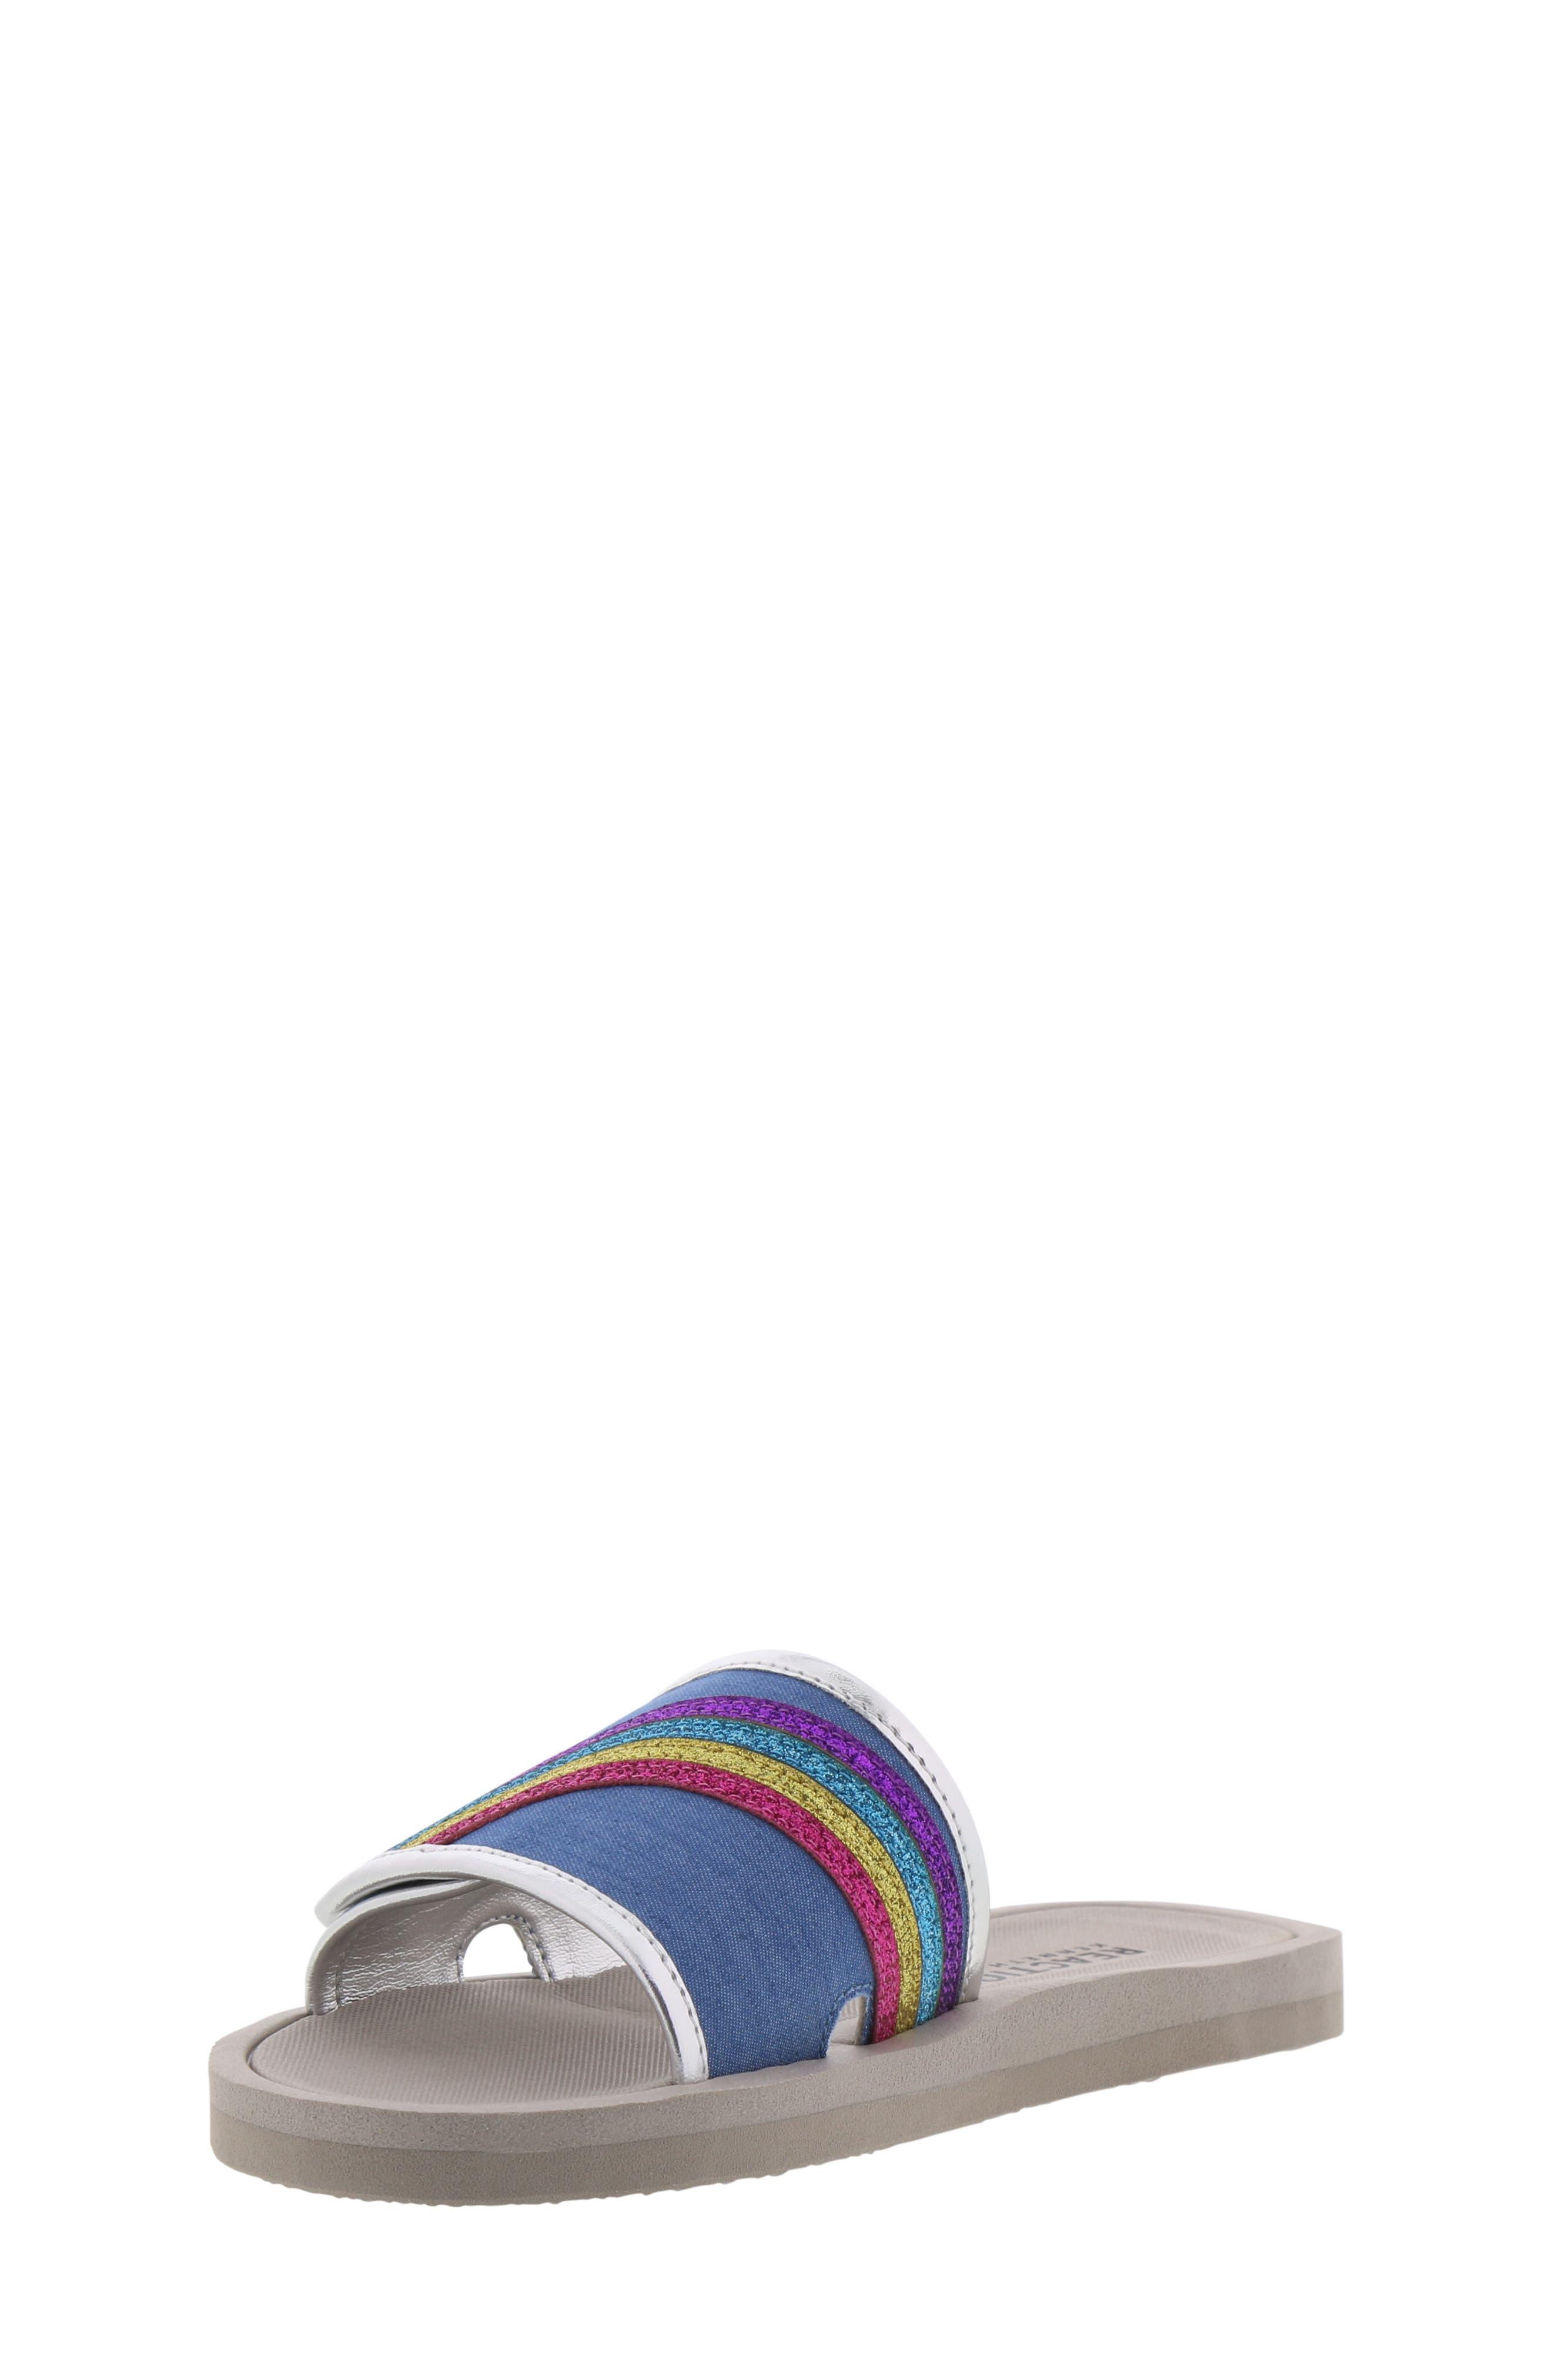 REACTION KENNETH COLE, Elise Karla Rainbow Slide Sandal, Alternate thumbnail 9, color, DENIM